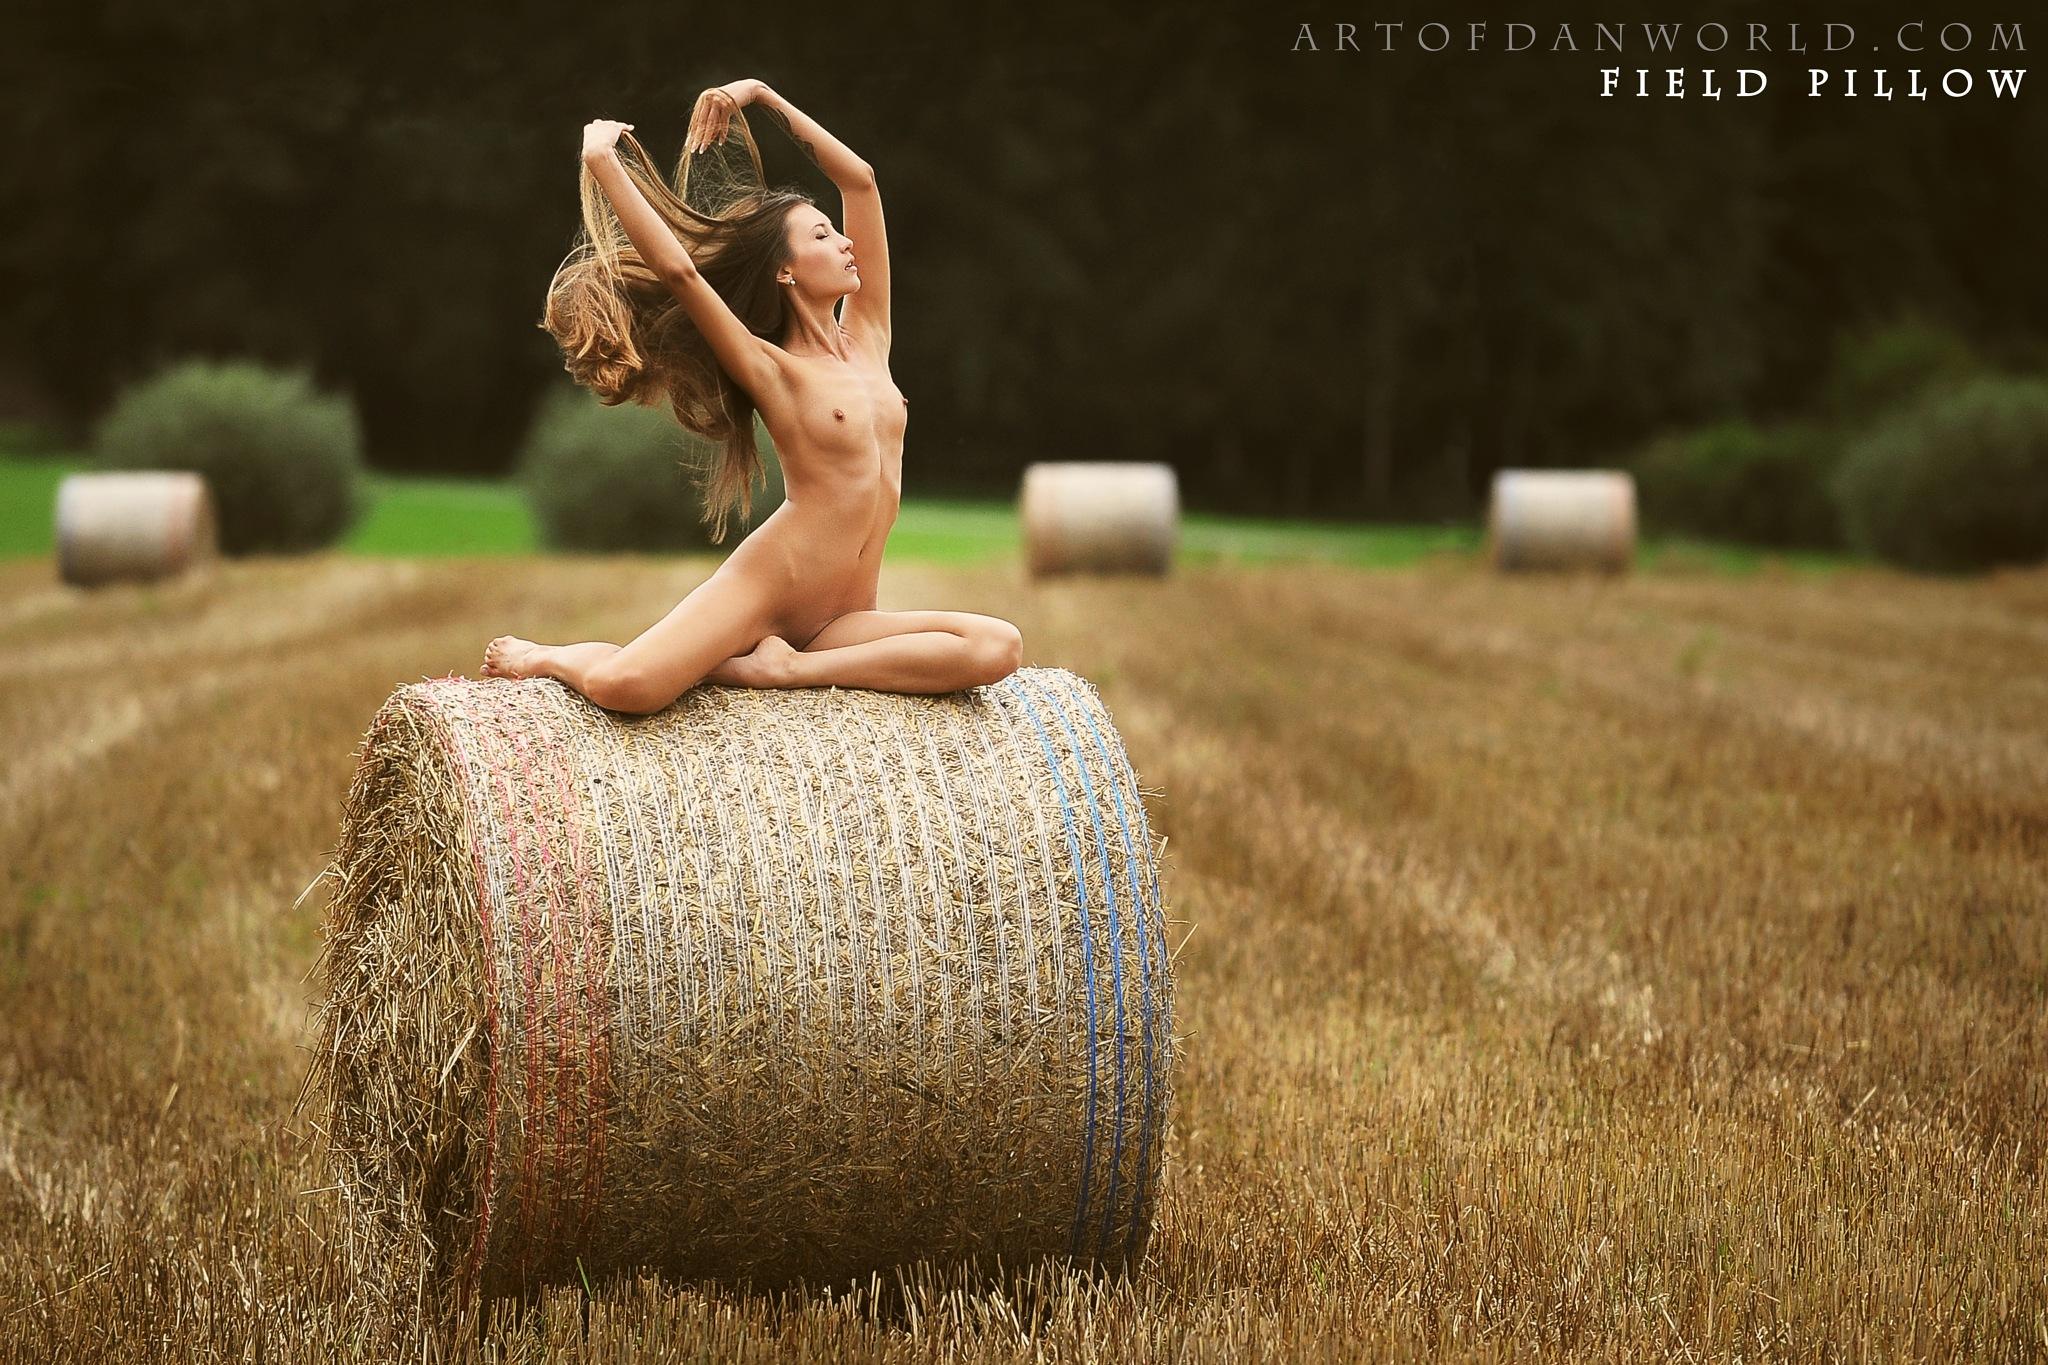 Field pillow by Artofdan Photography